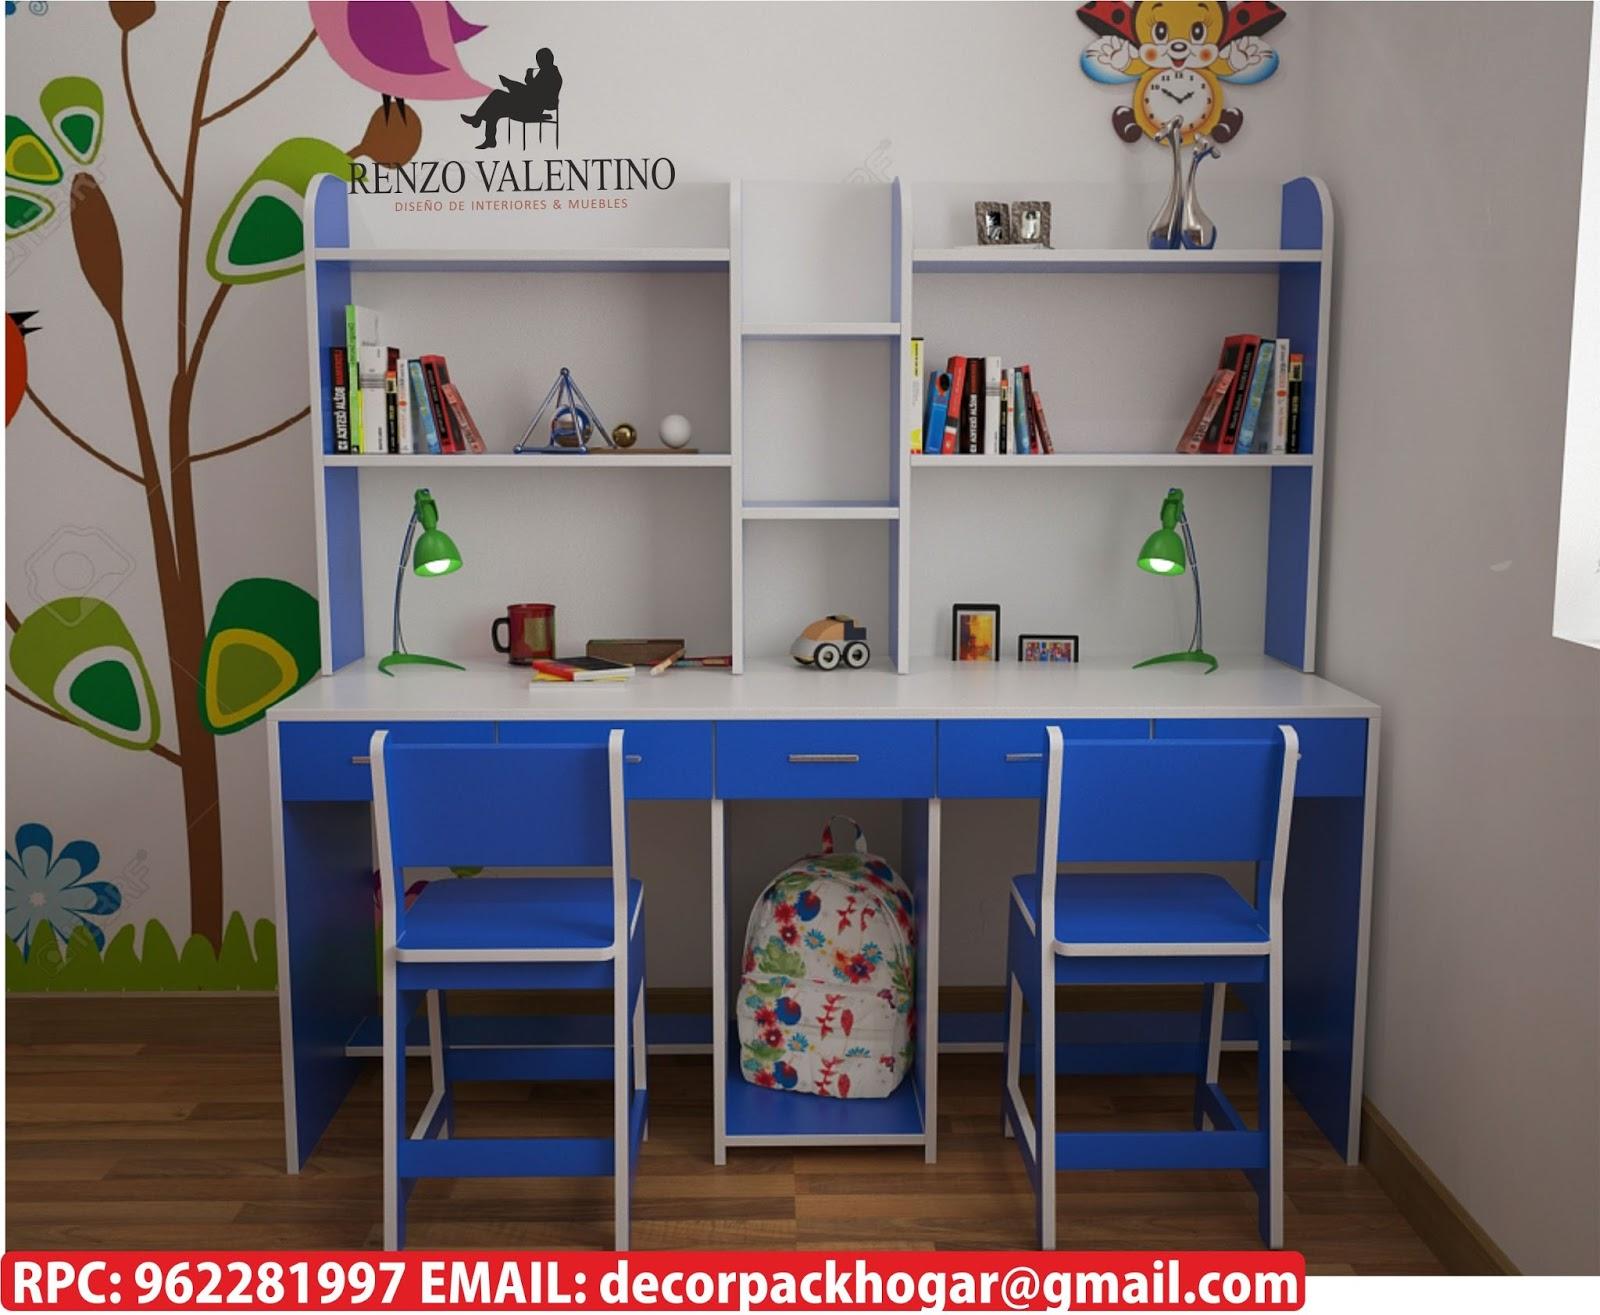 Dise os fabricacion de closet cocina y muebles de oficina for Libro de muebles de melamina